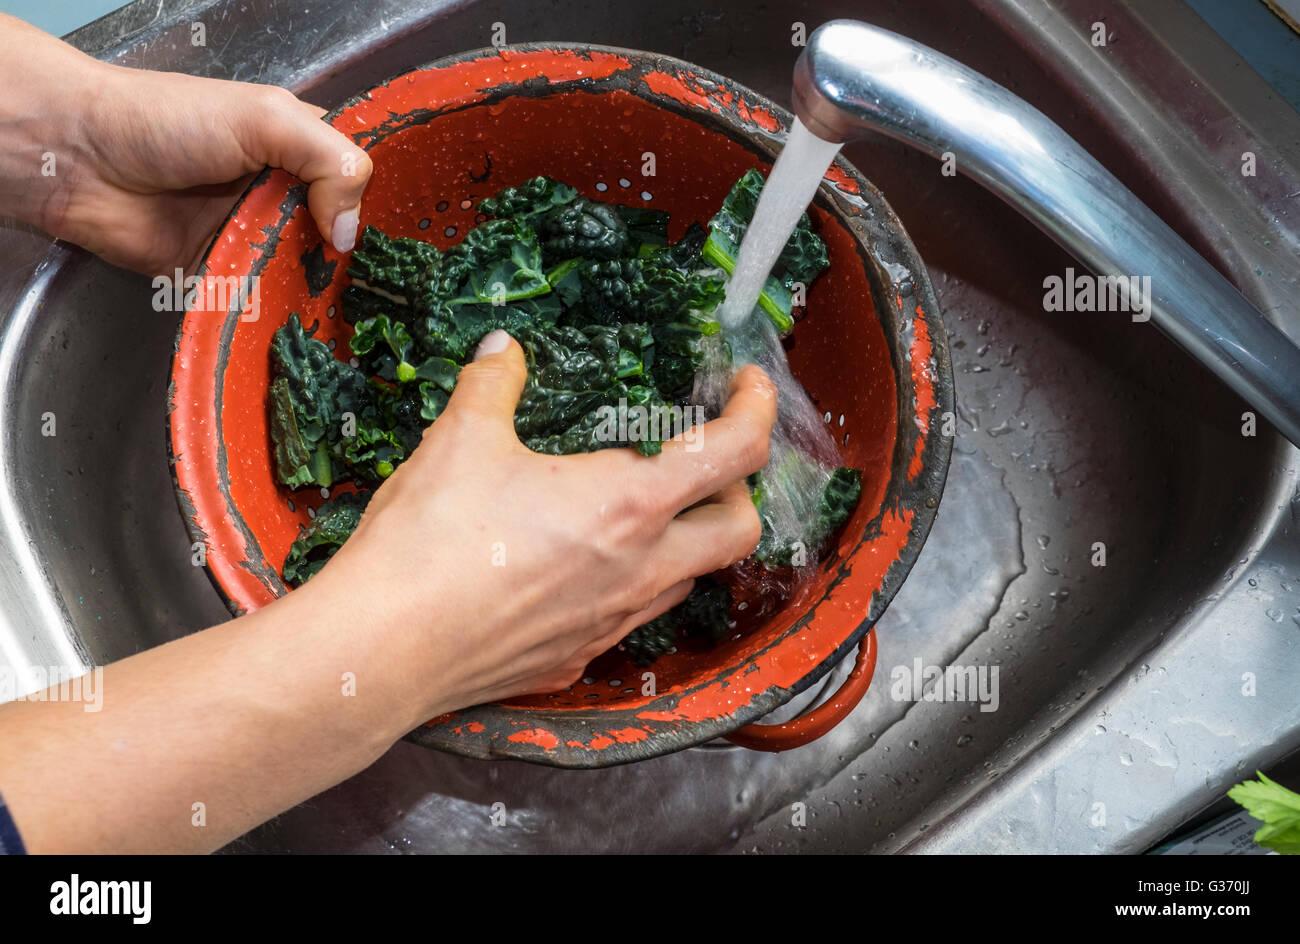 Washing chopped Tuscan kale under running water in red colander - Stock Image